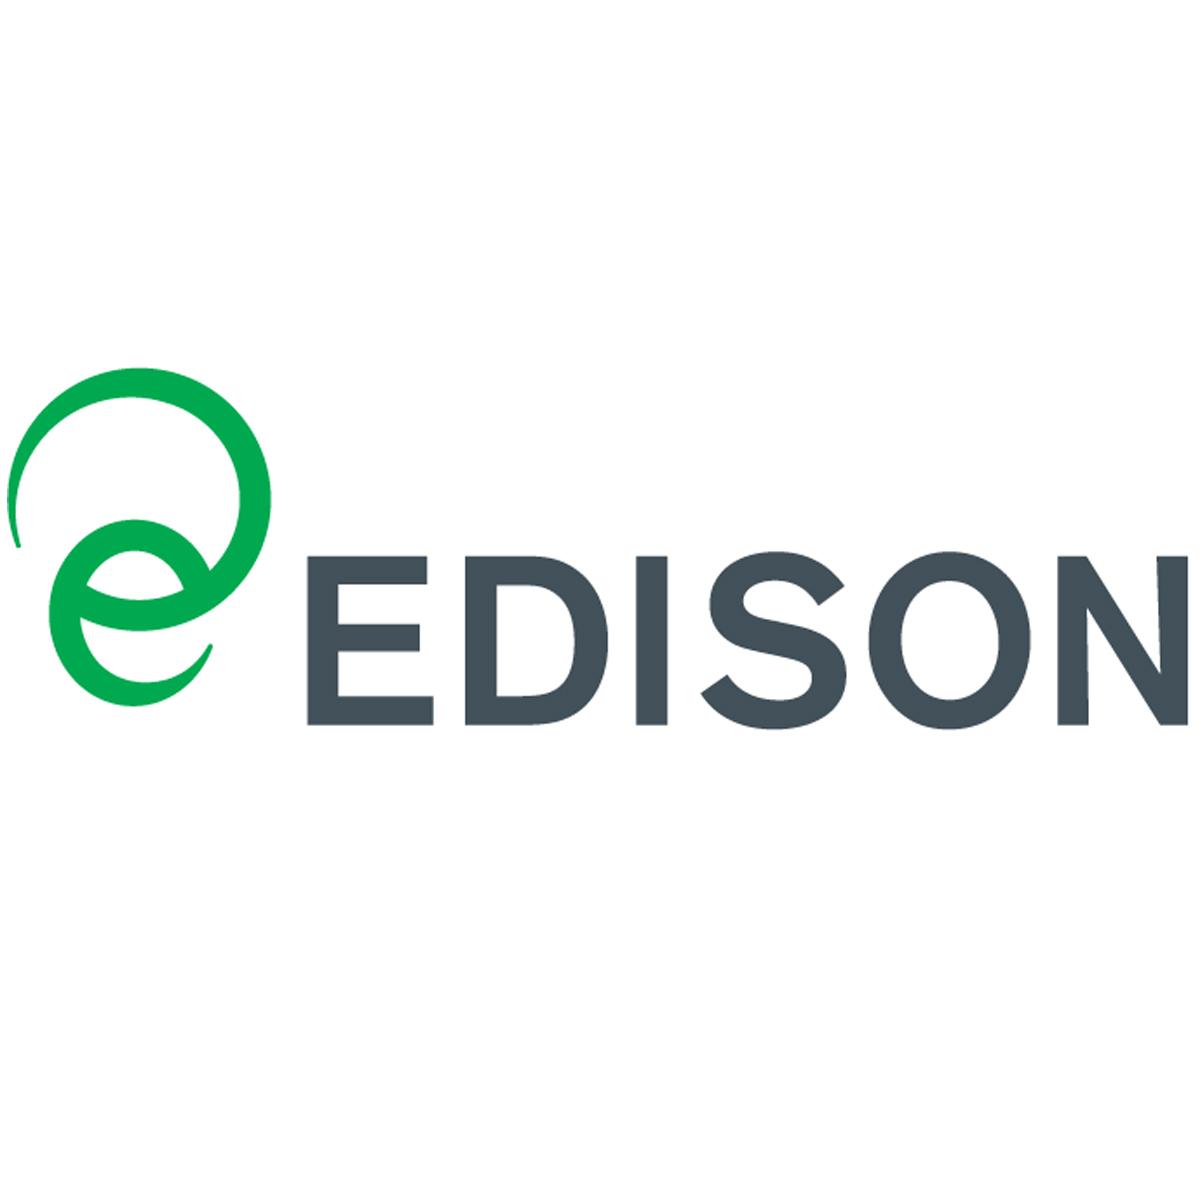 EDISON: SCAM's Customer